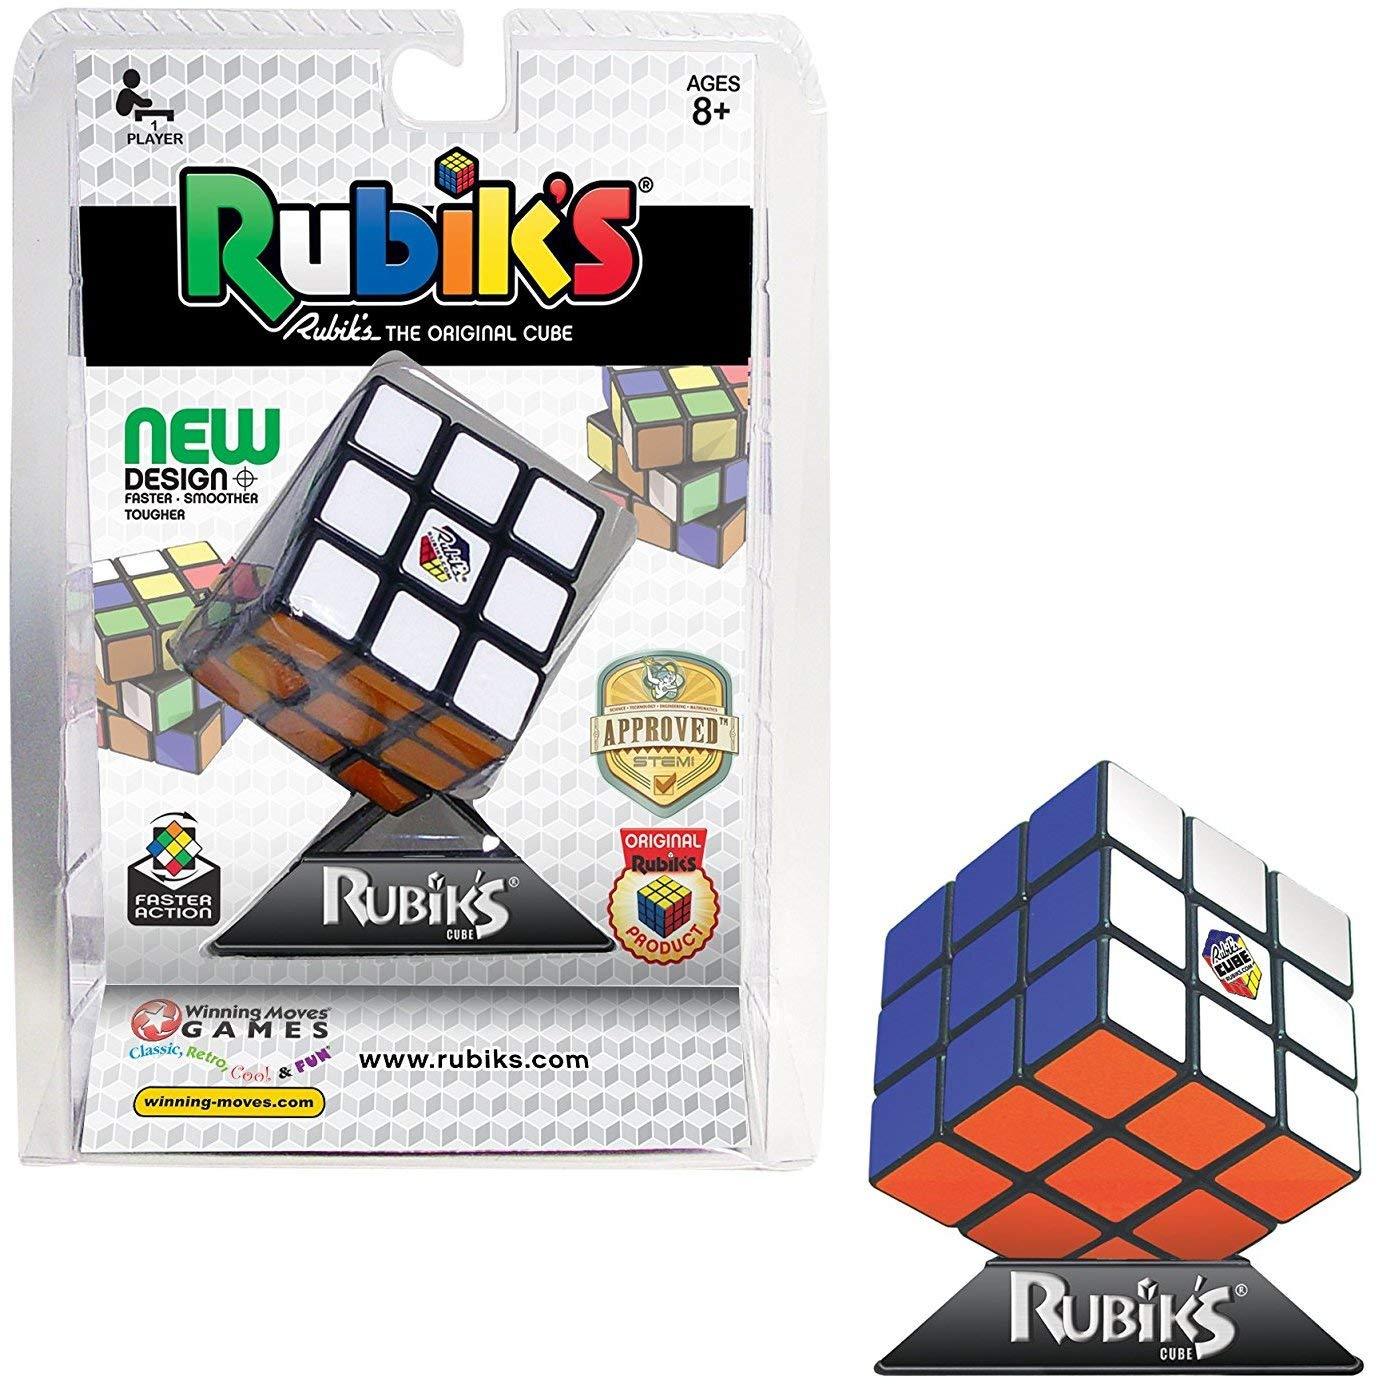 B004FG0ZWI Rubik's Cube 713EnMTMBzL